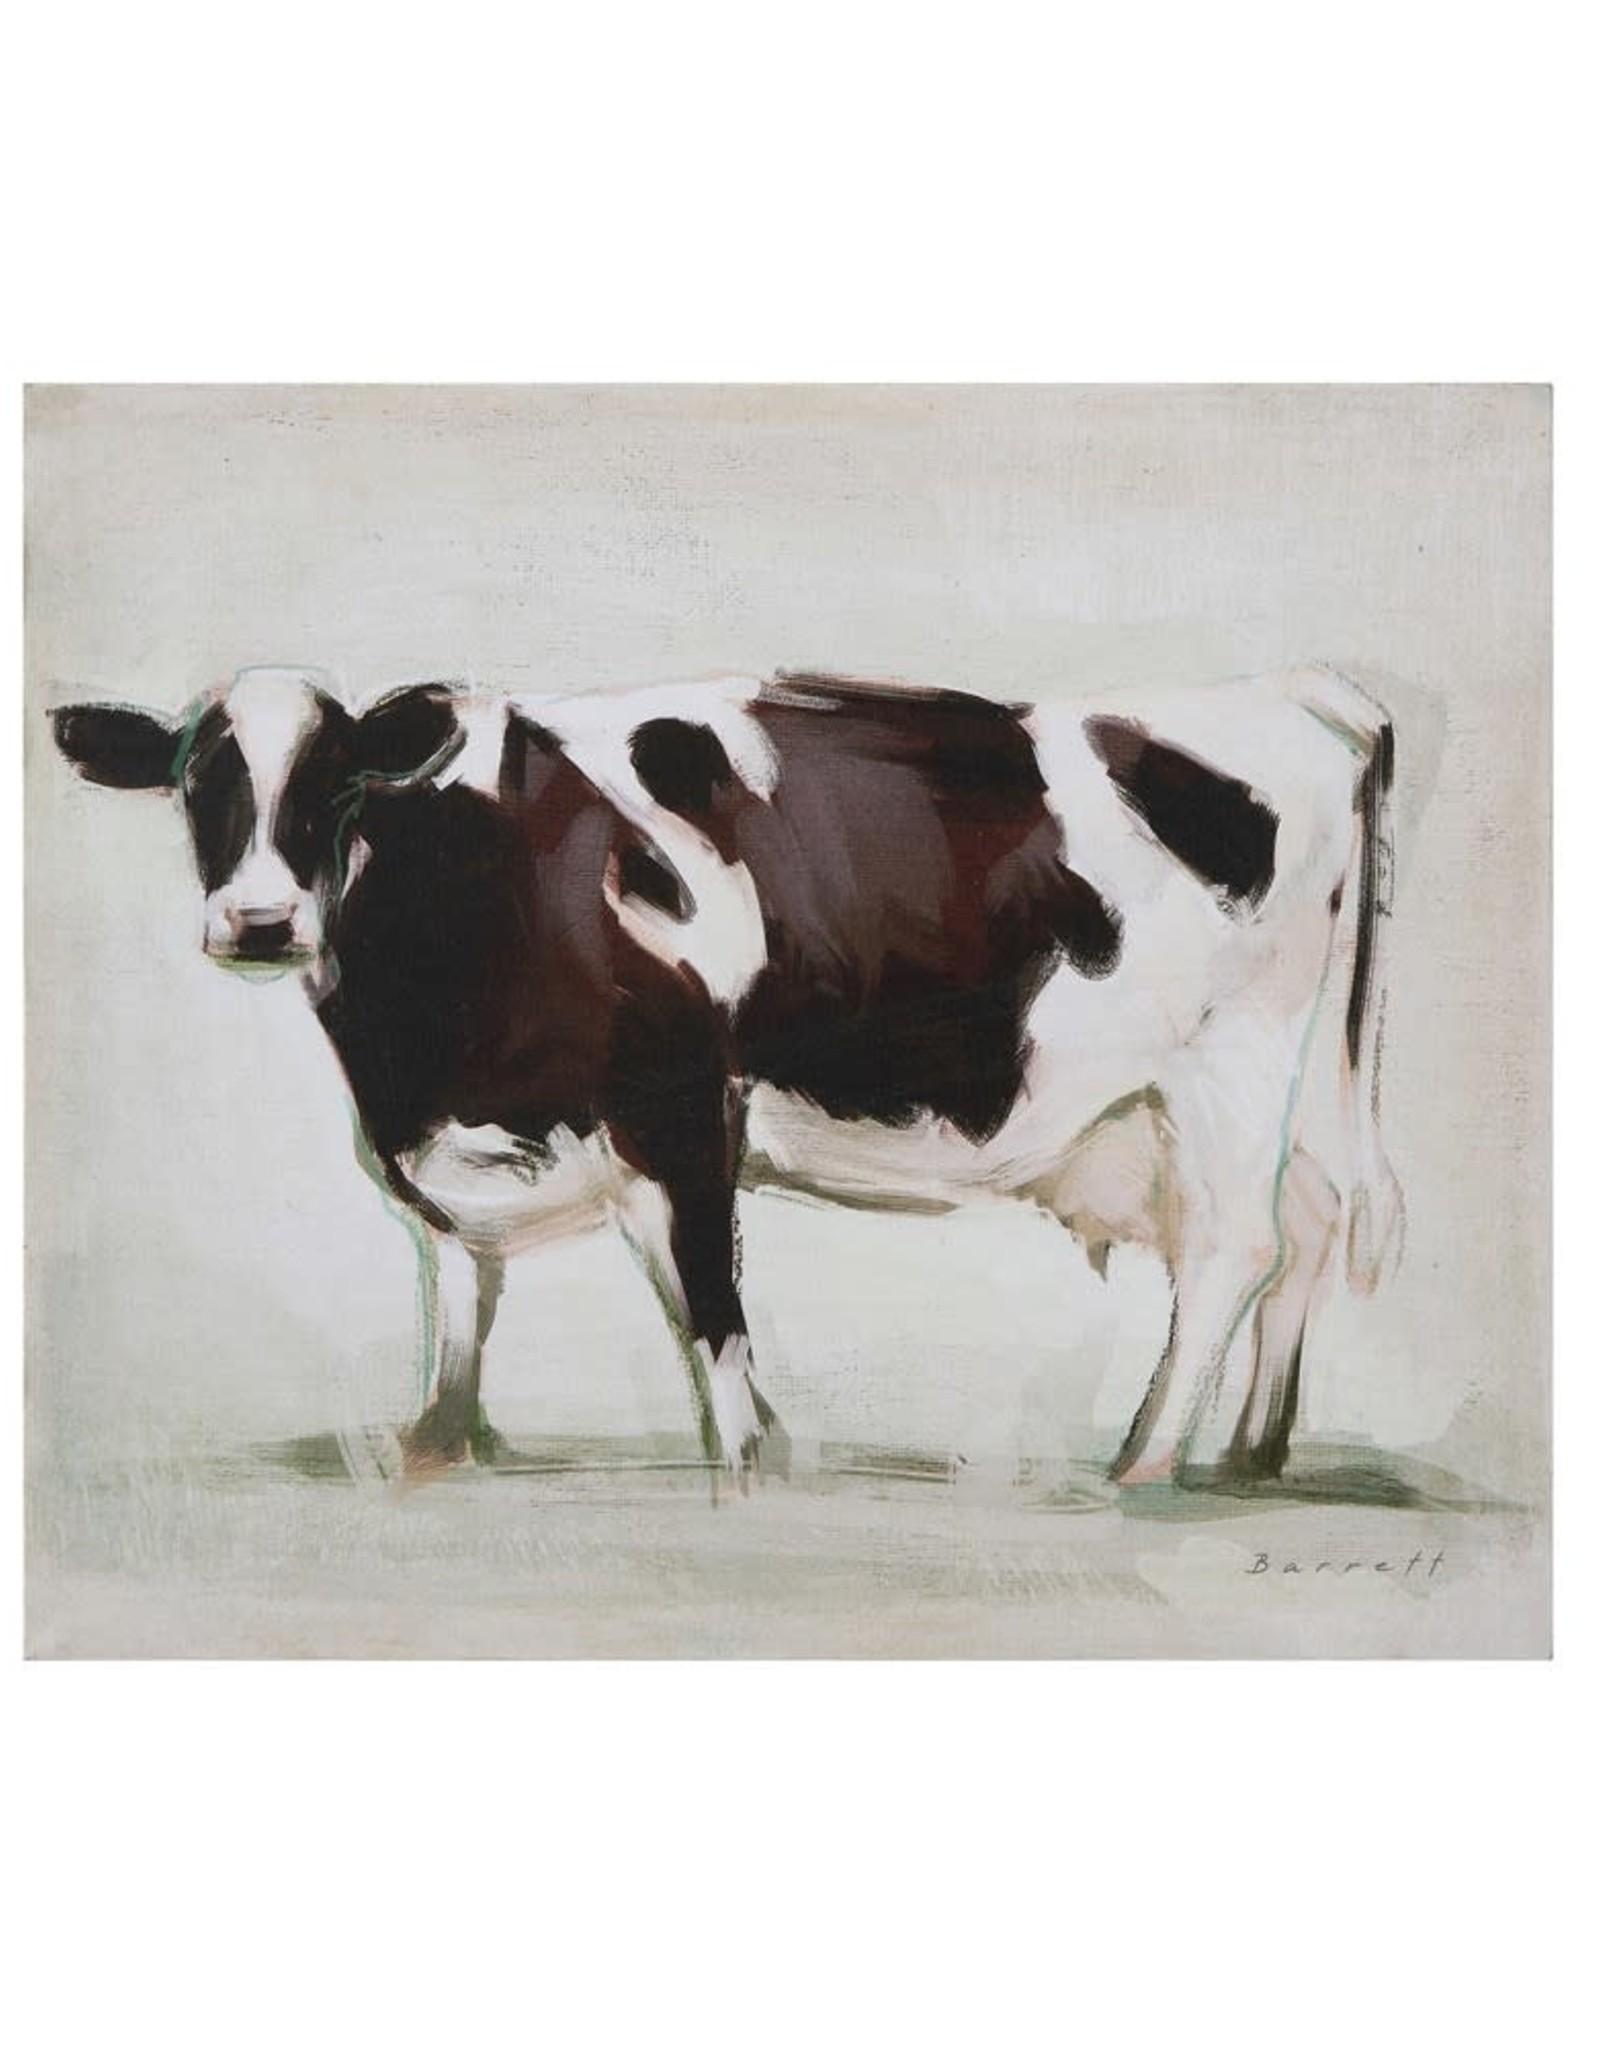 Creative Co-op Canvas Wall Decor w/ Cow